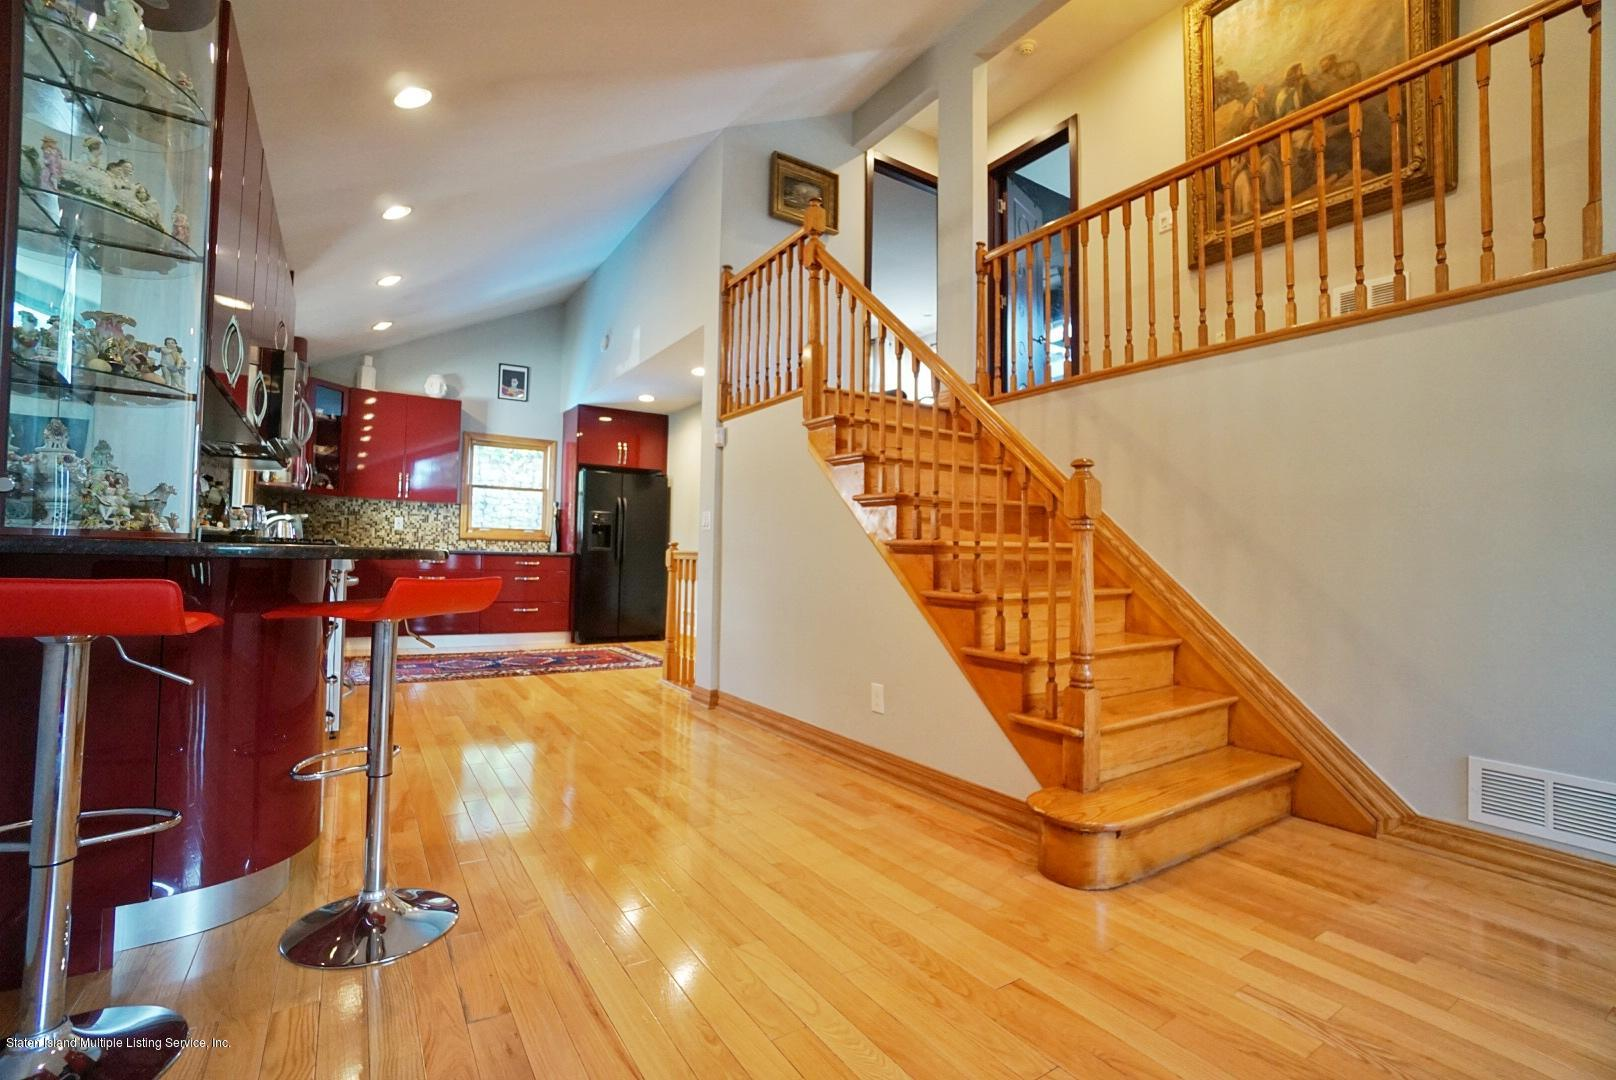 Single Family - Detached 48 Ocean Terrace  Staten Island, NY 10314, MLS-1130826-18